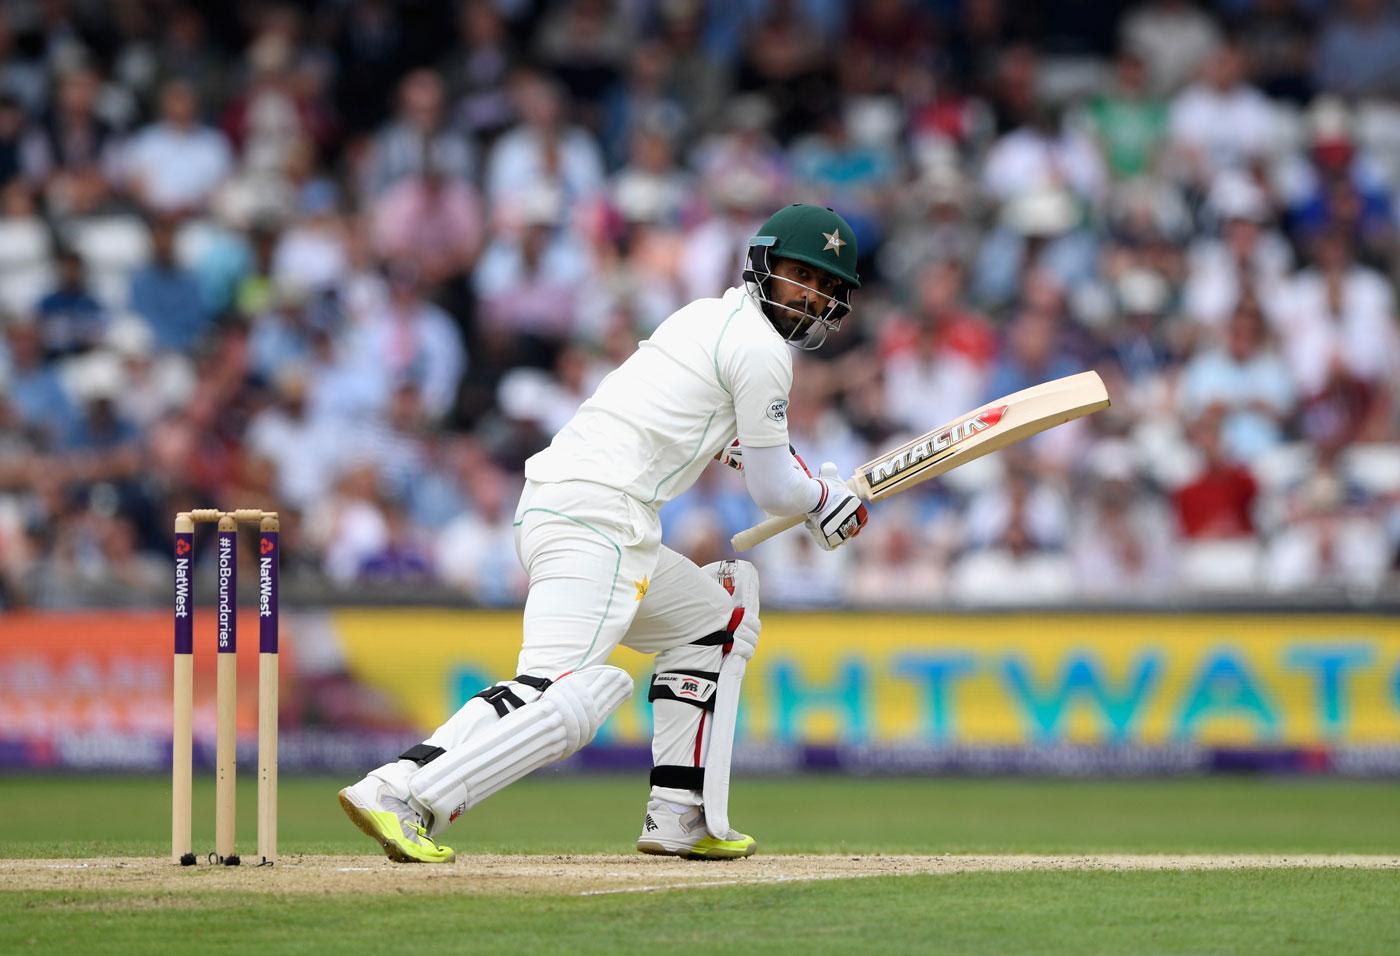 Abid Ali and Usman Salahuddin give Pakistan A a glimmer of hope against England Lions